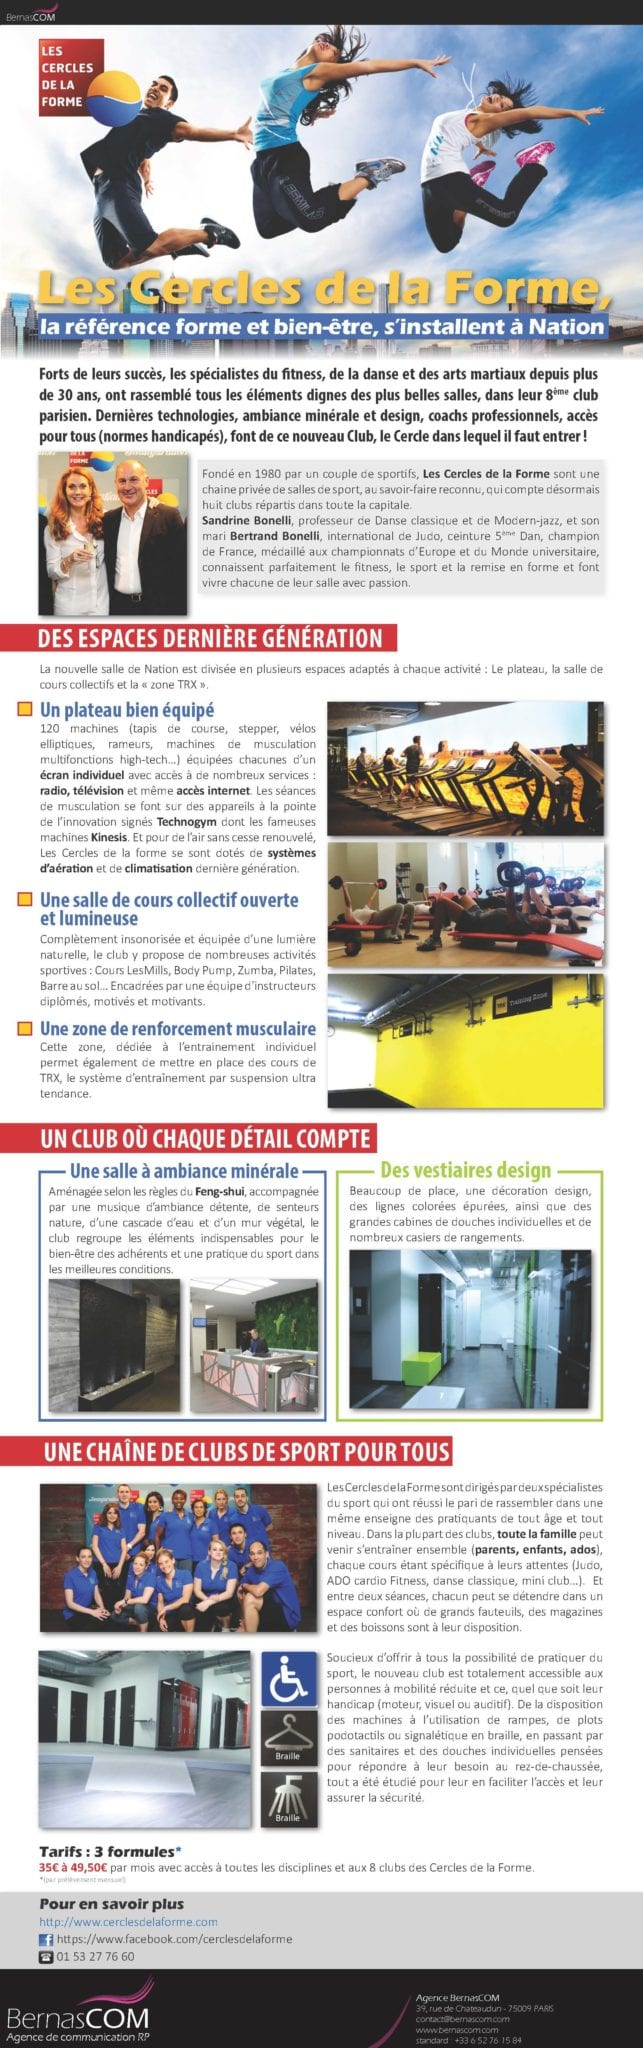 CDLF - Communiqué de presse - JUIN 13 2